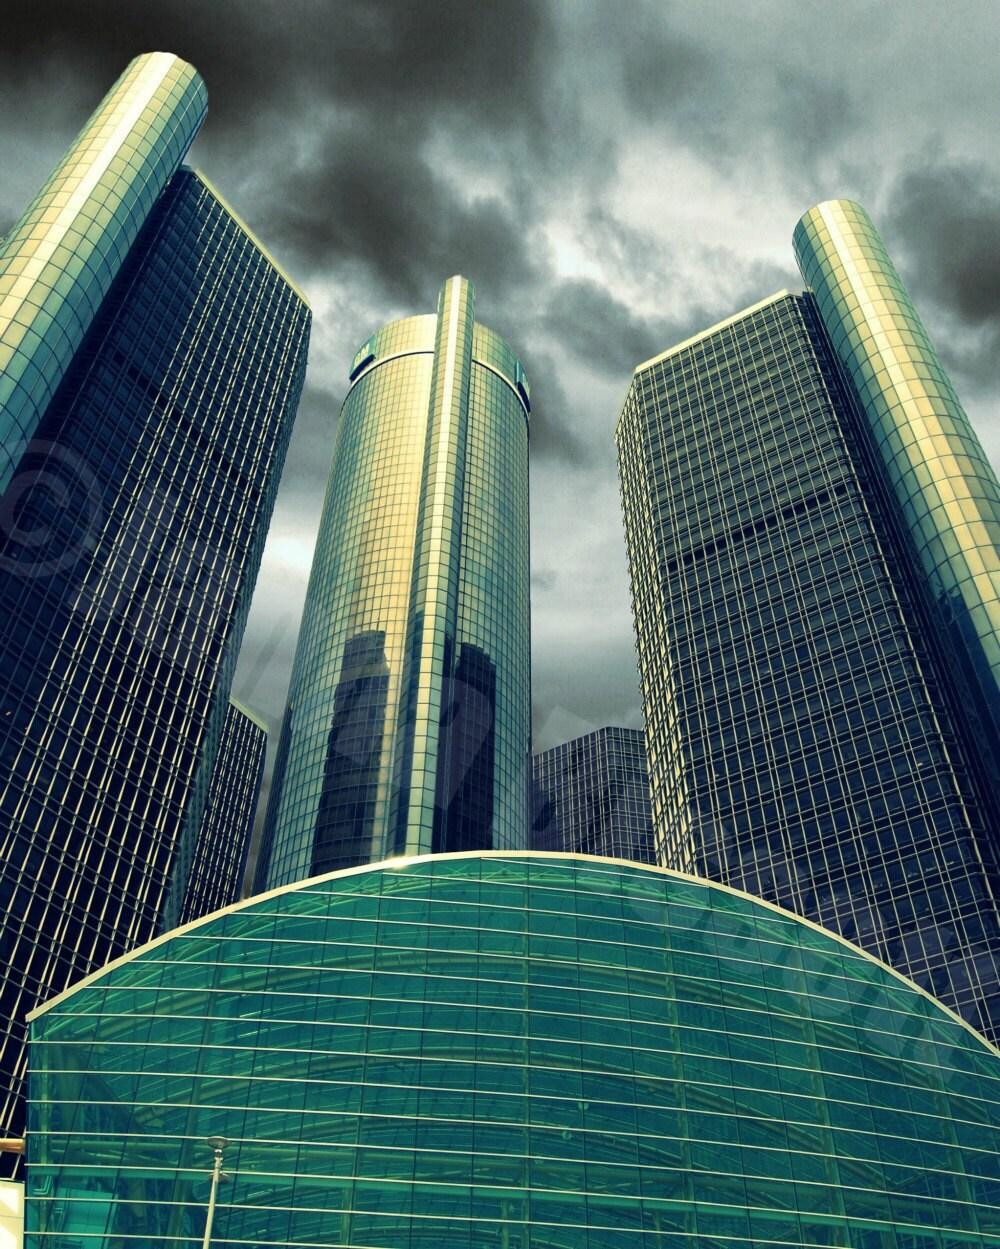 Detroit Ren Cen Building, Fine Art Photograph on Metallic Paper